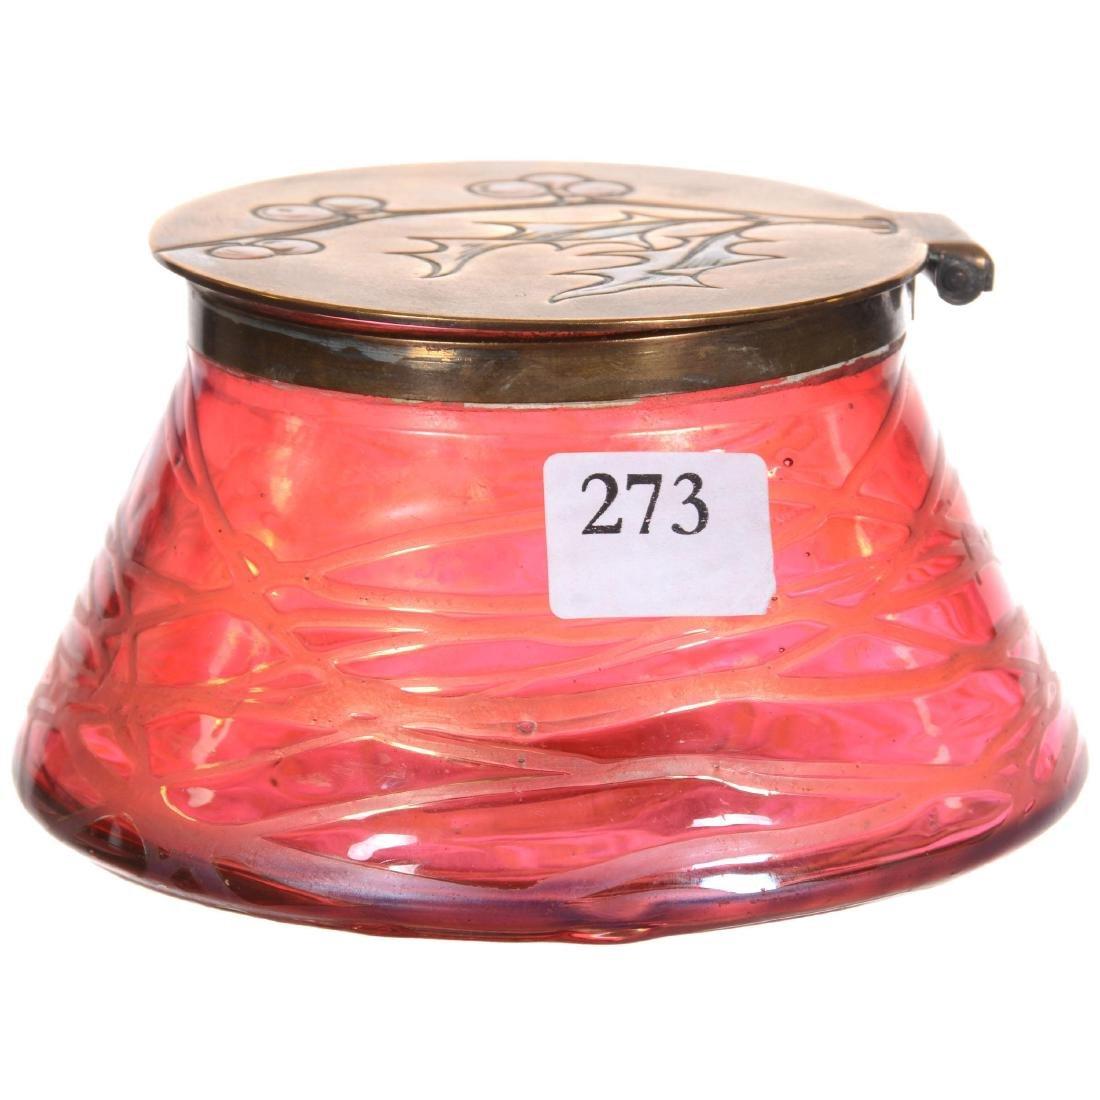 Unmarked Loetz Style Art Glass Hinged Box